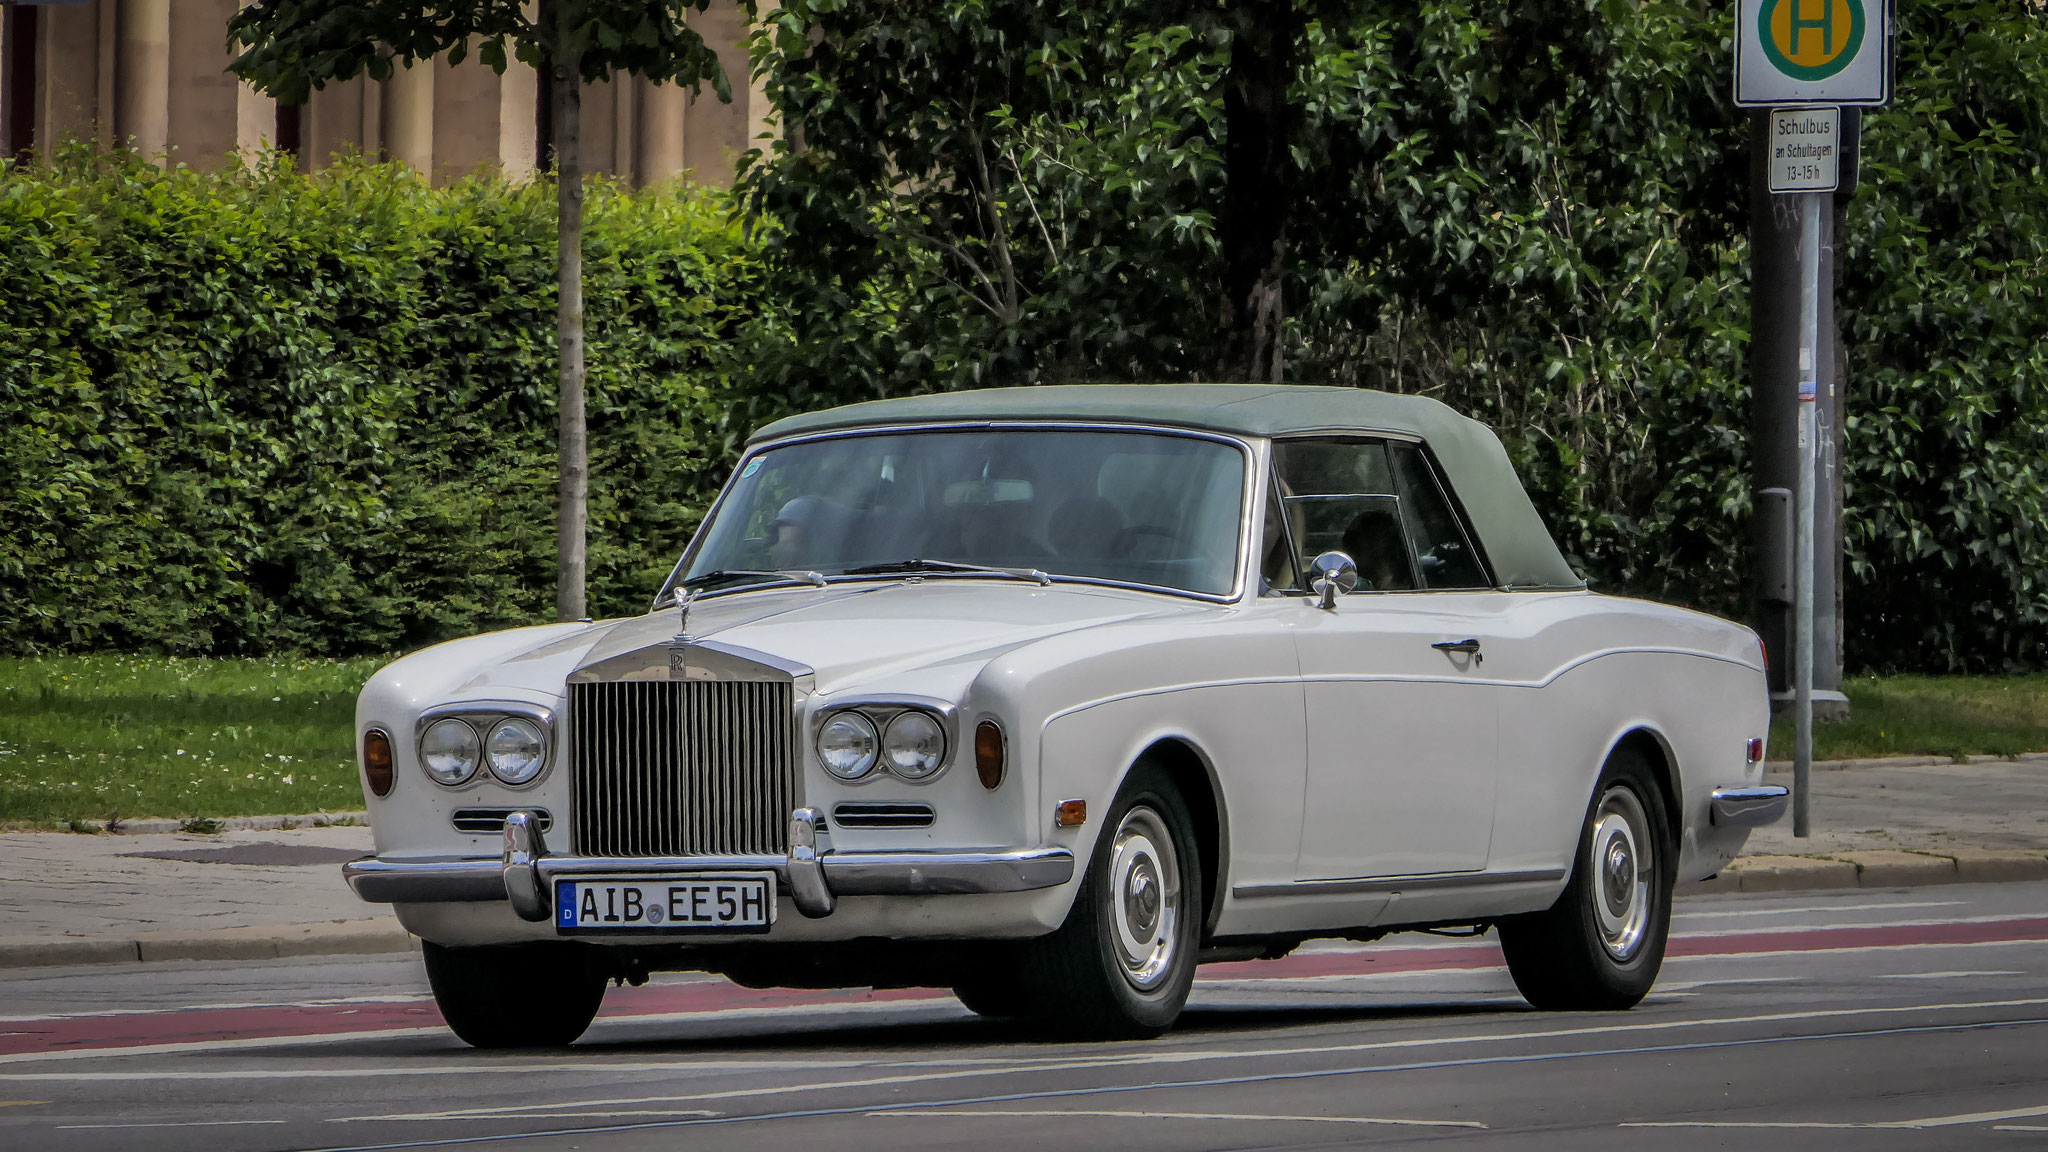 Rolls Royce Corniche - AIB-EE-5H